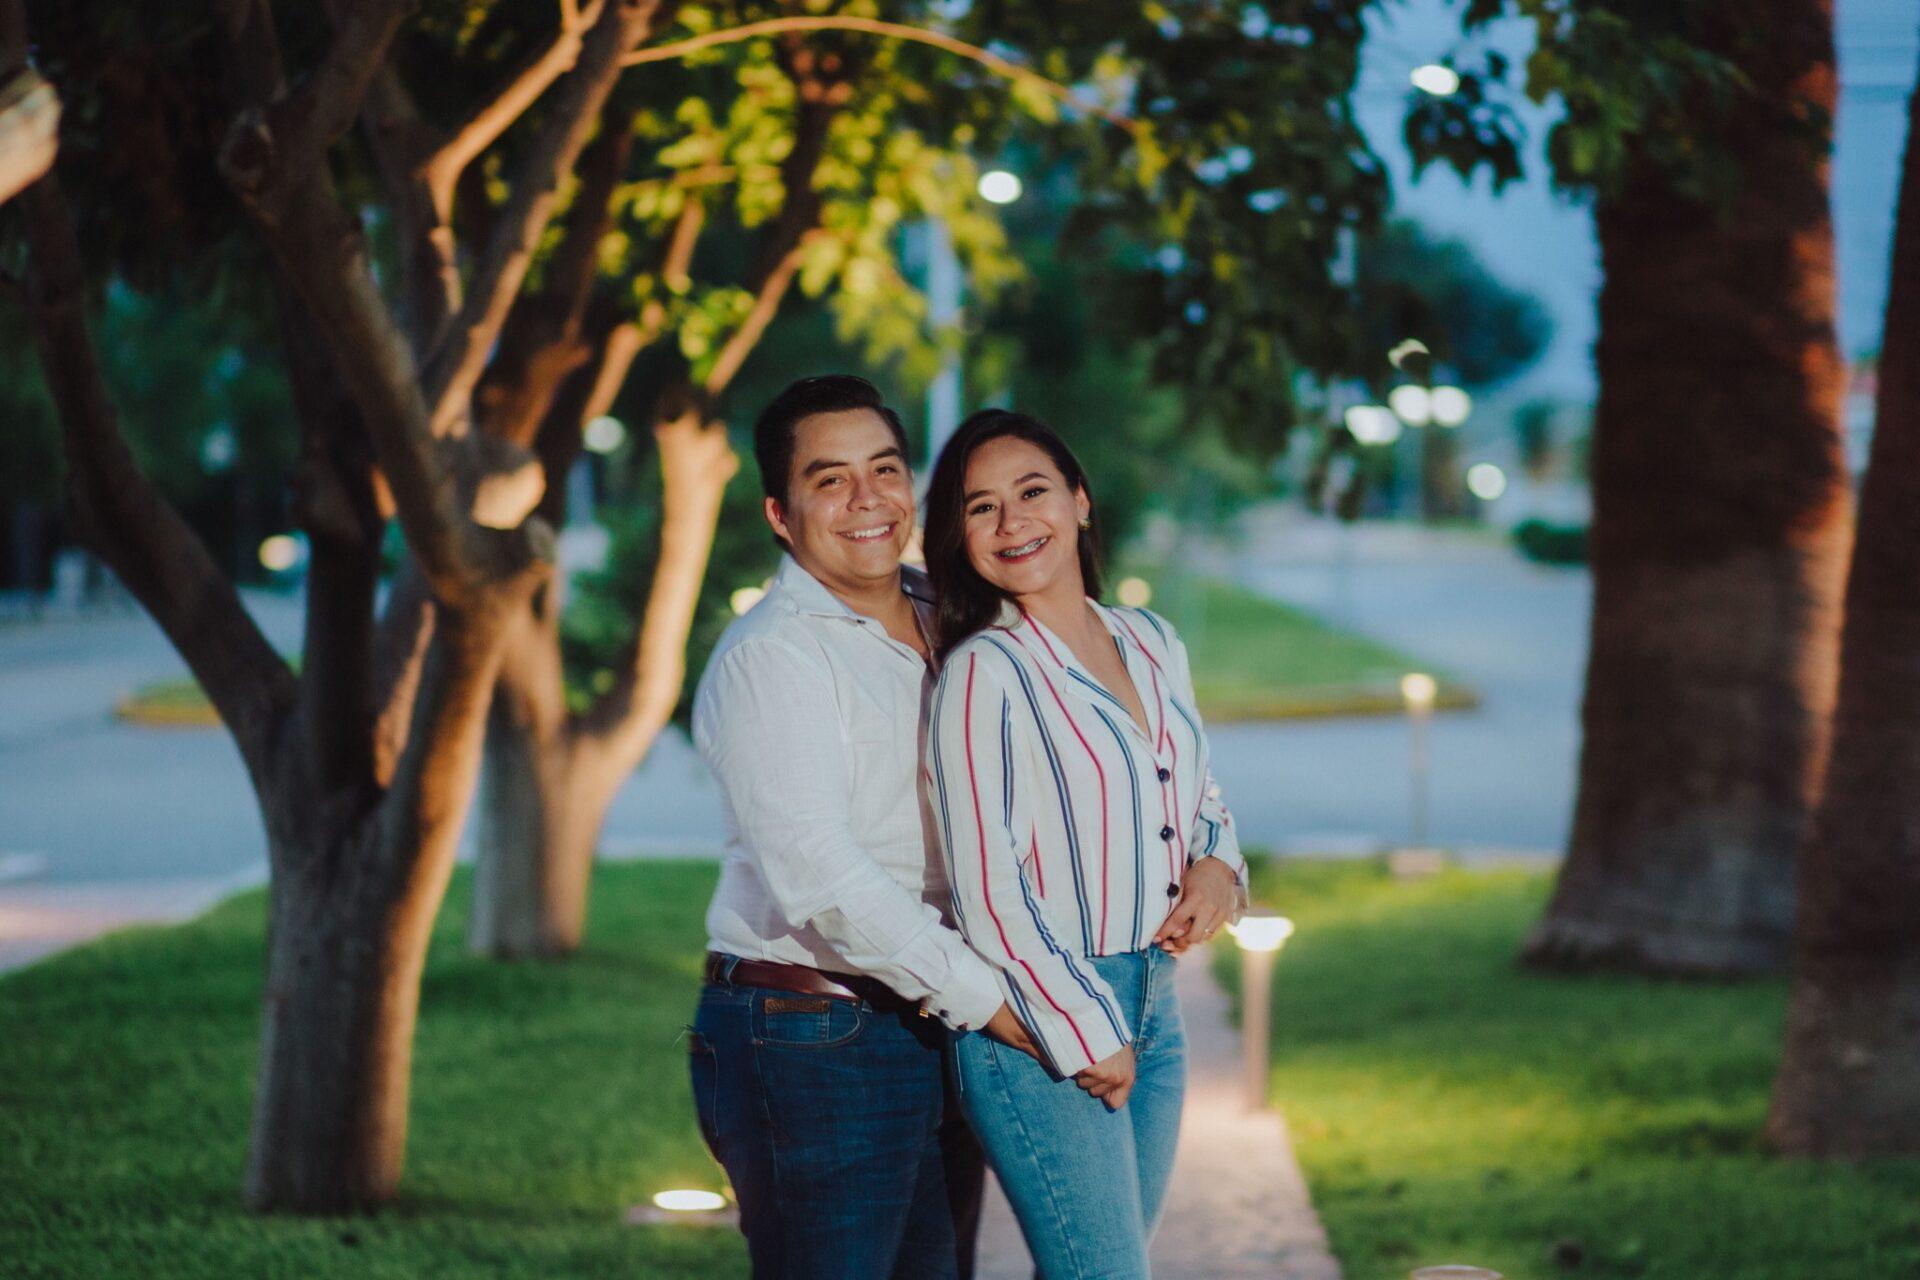 javier_noriega_fotografo_bodas_save_the_date_preboda_torreon_coahuila_zacatecas_wedding_photographer1